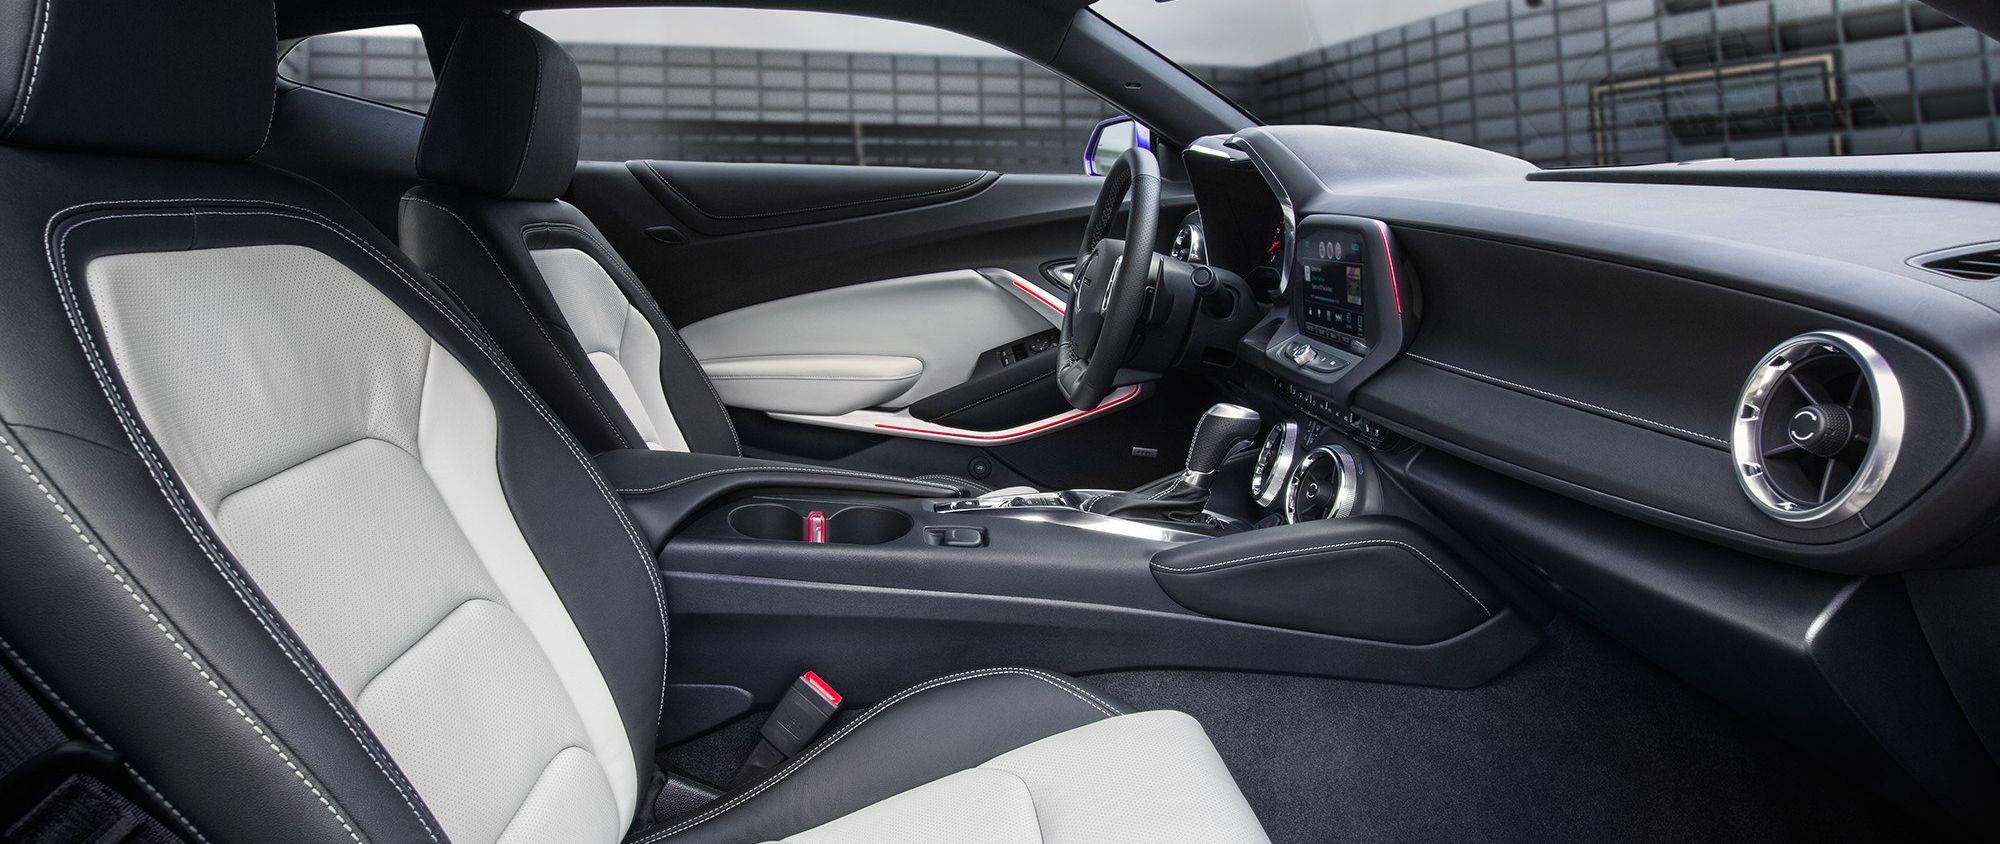 The Camaro's Stylish, Sporty Seating